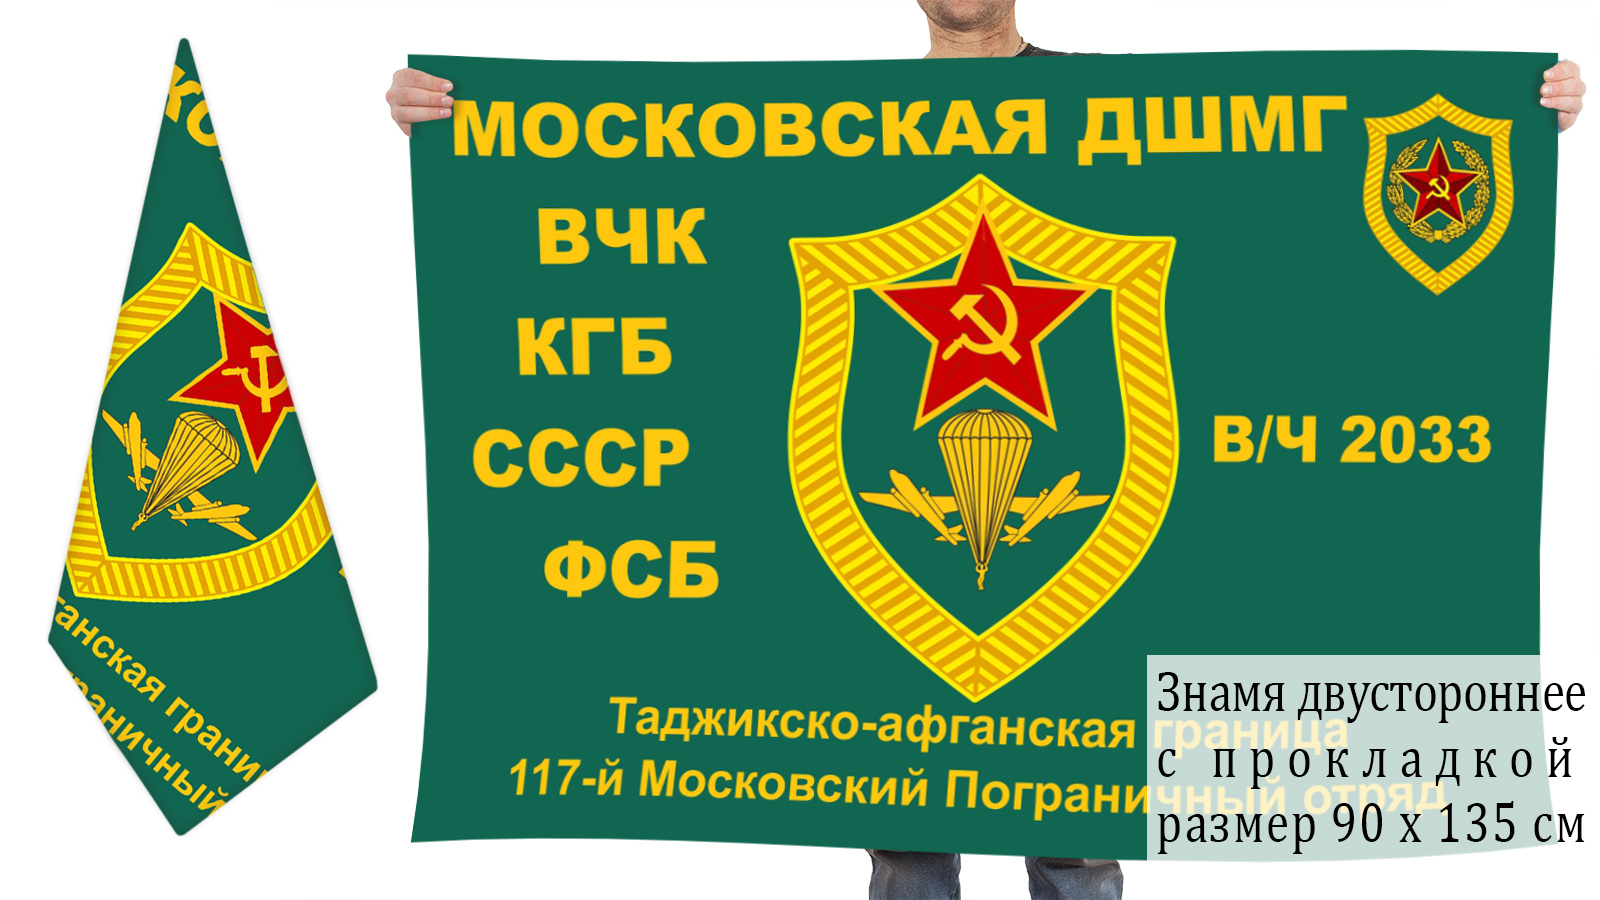 Двусторонний флаг ДШМГ 117 Московского пограничного отряда